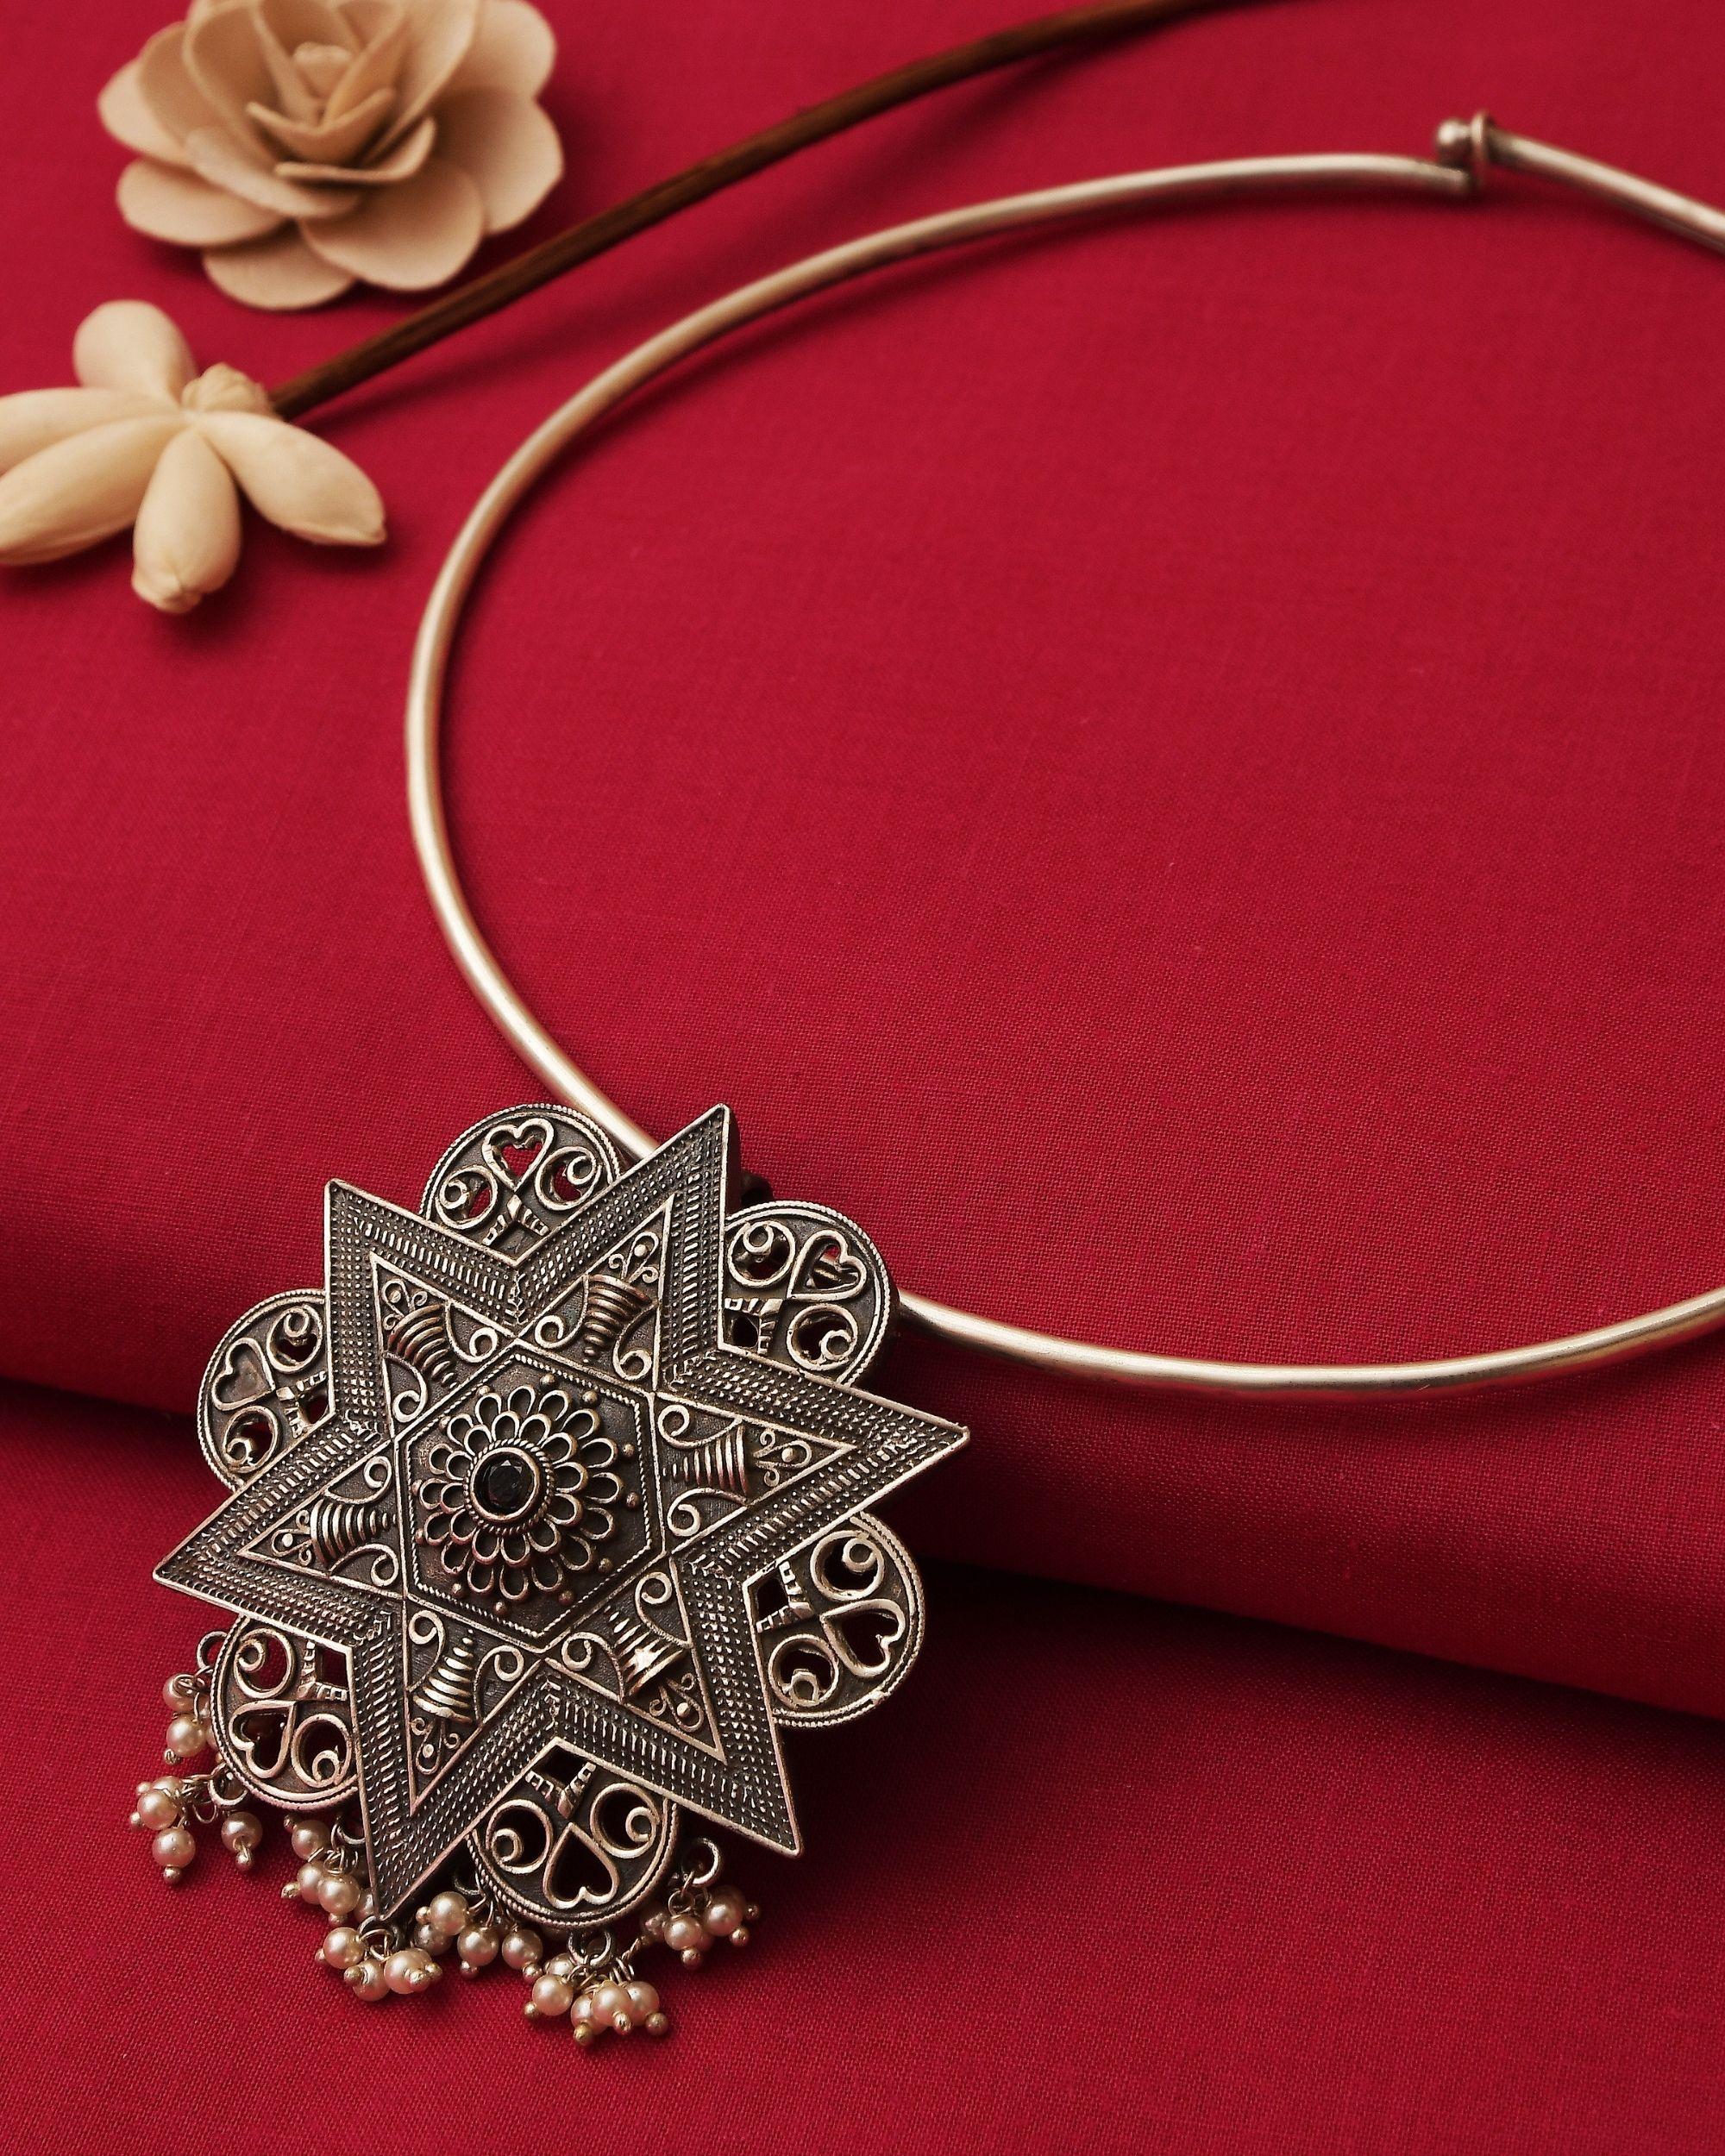 Star engraved neckpiece